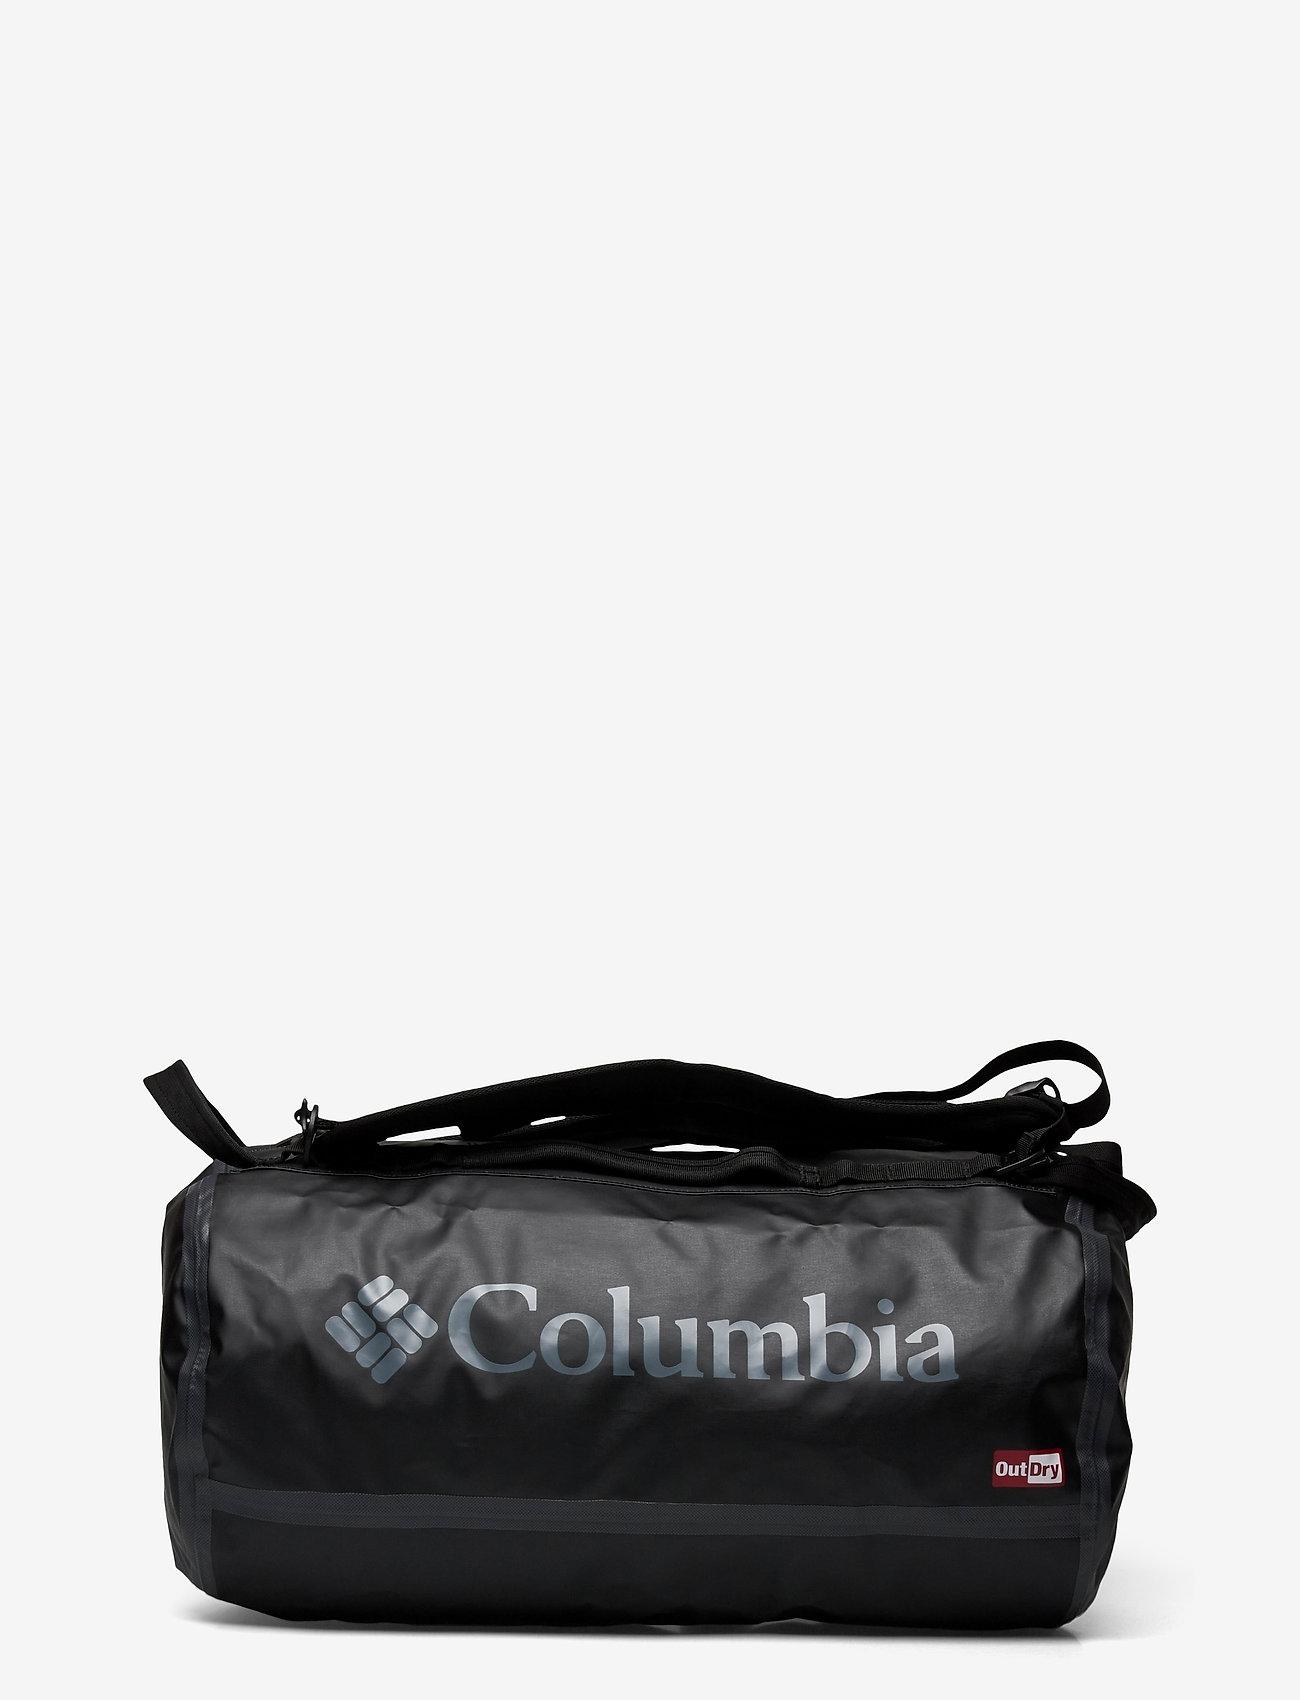 Columbia - OutDry Ex 80L Duffle - sacs de sport - black - 0